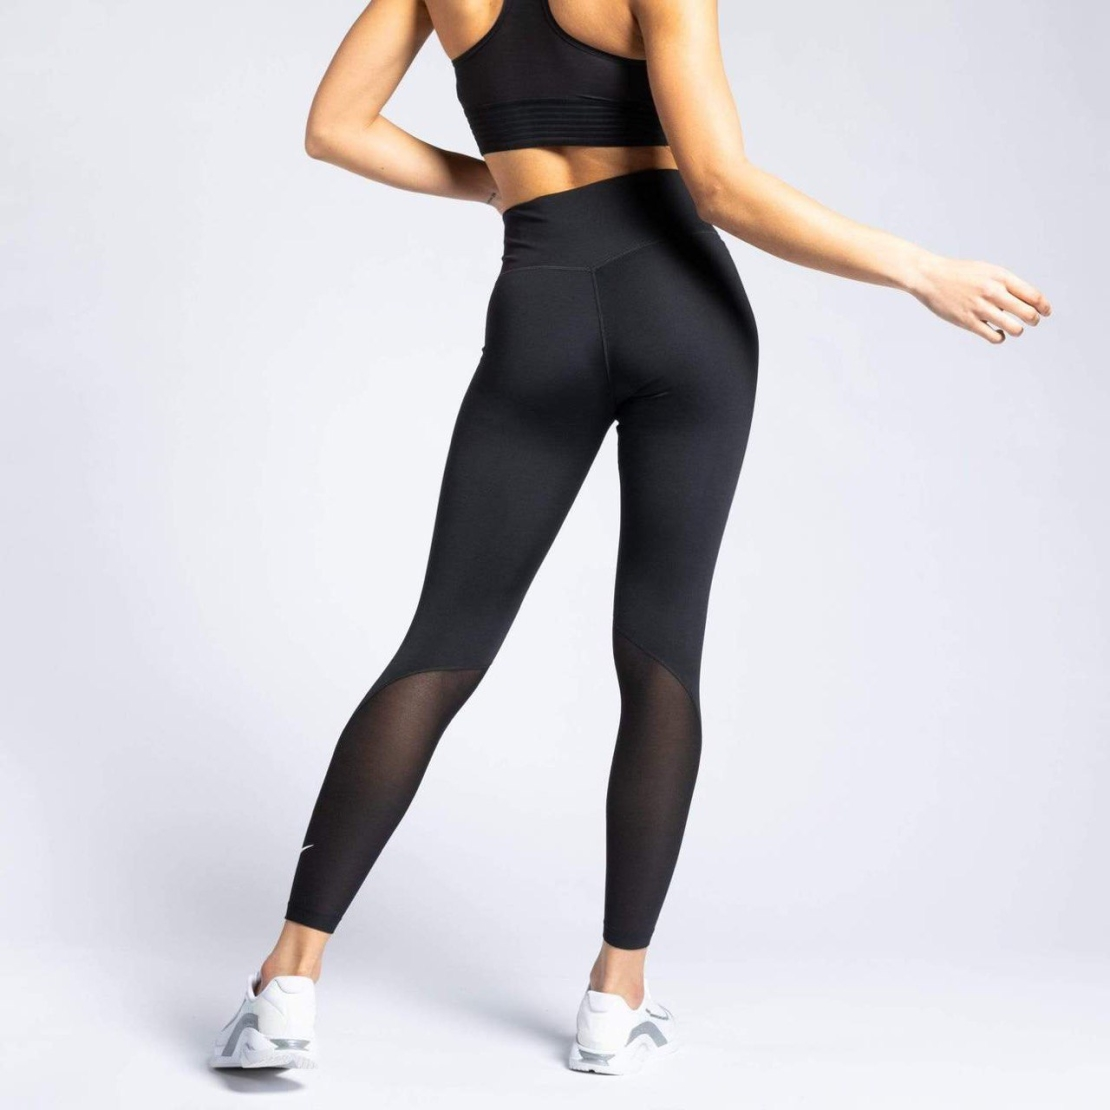 טייץ נייק נשים   Nike One Women's Mid-Rise 7/8 Leggings